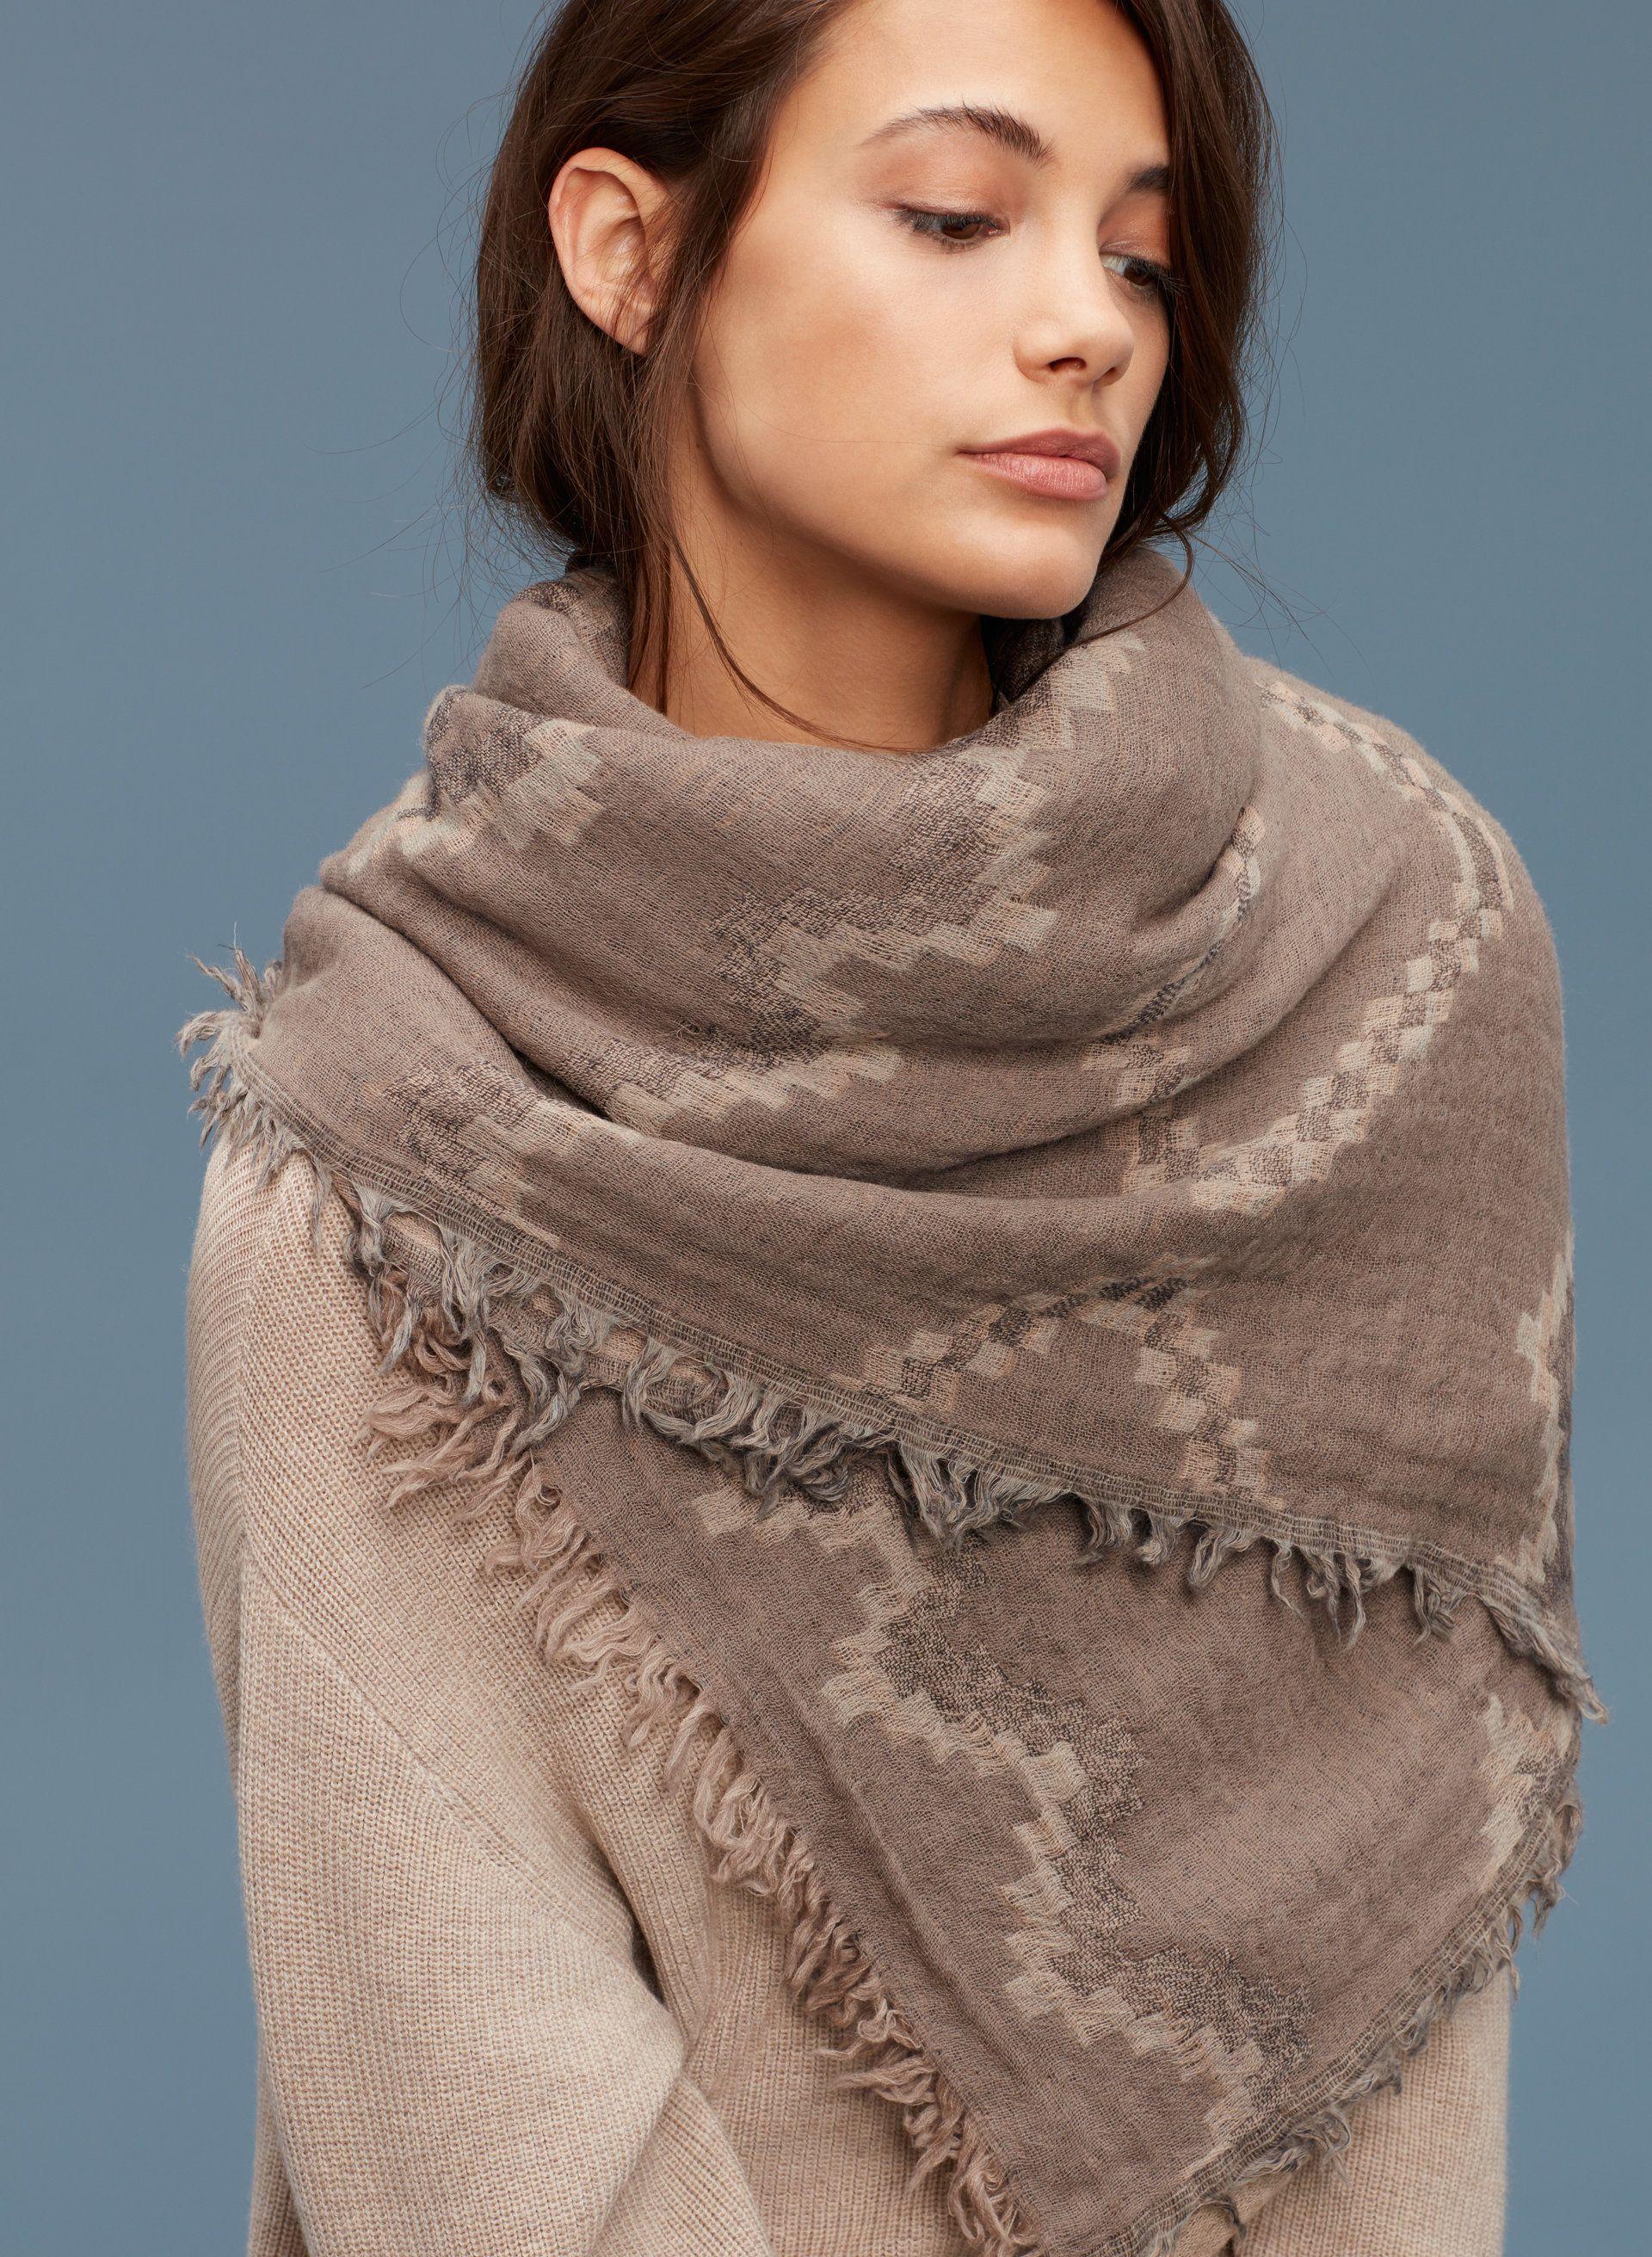 1fdd78d3c8137 Diamond mosaic blanket scarf in 2019 | { killer threads } | Aritzia ...